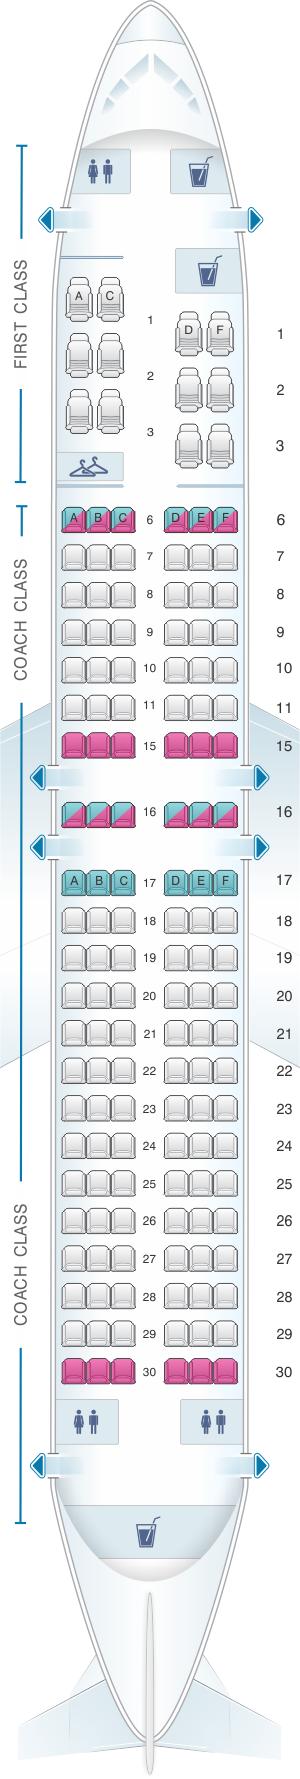 Seat Map Alaska Airlines - Horizon Air Boeing B737 400 ...